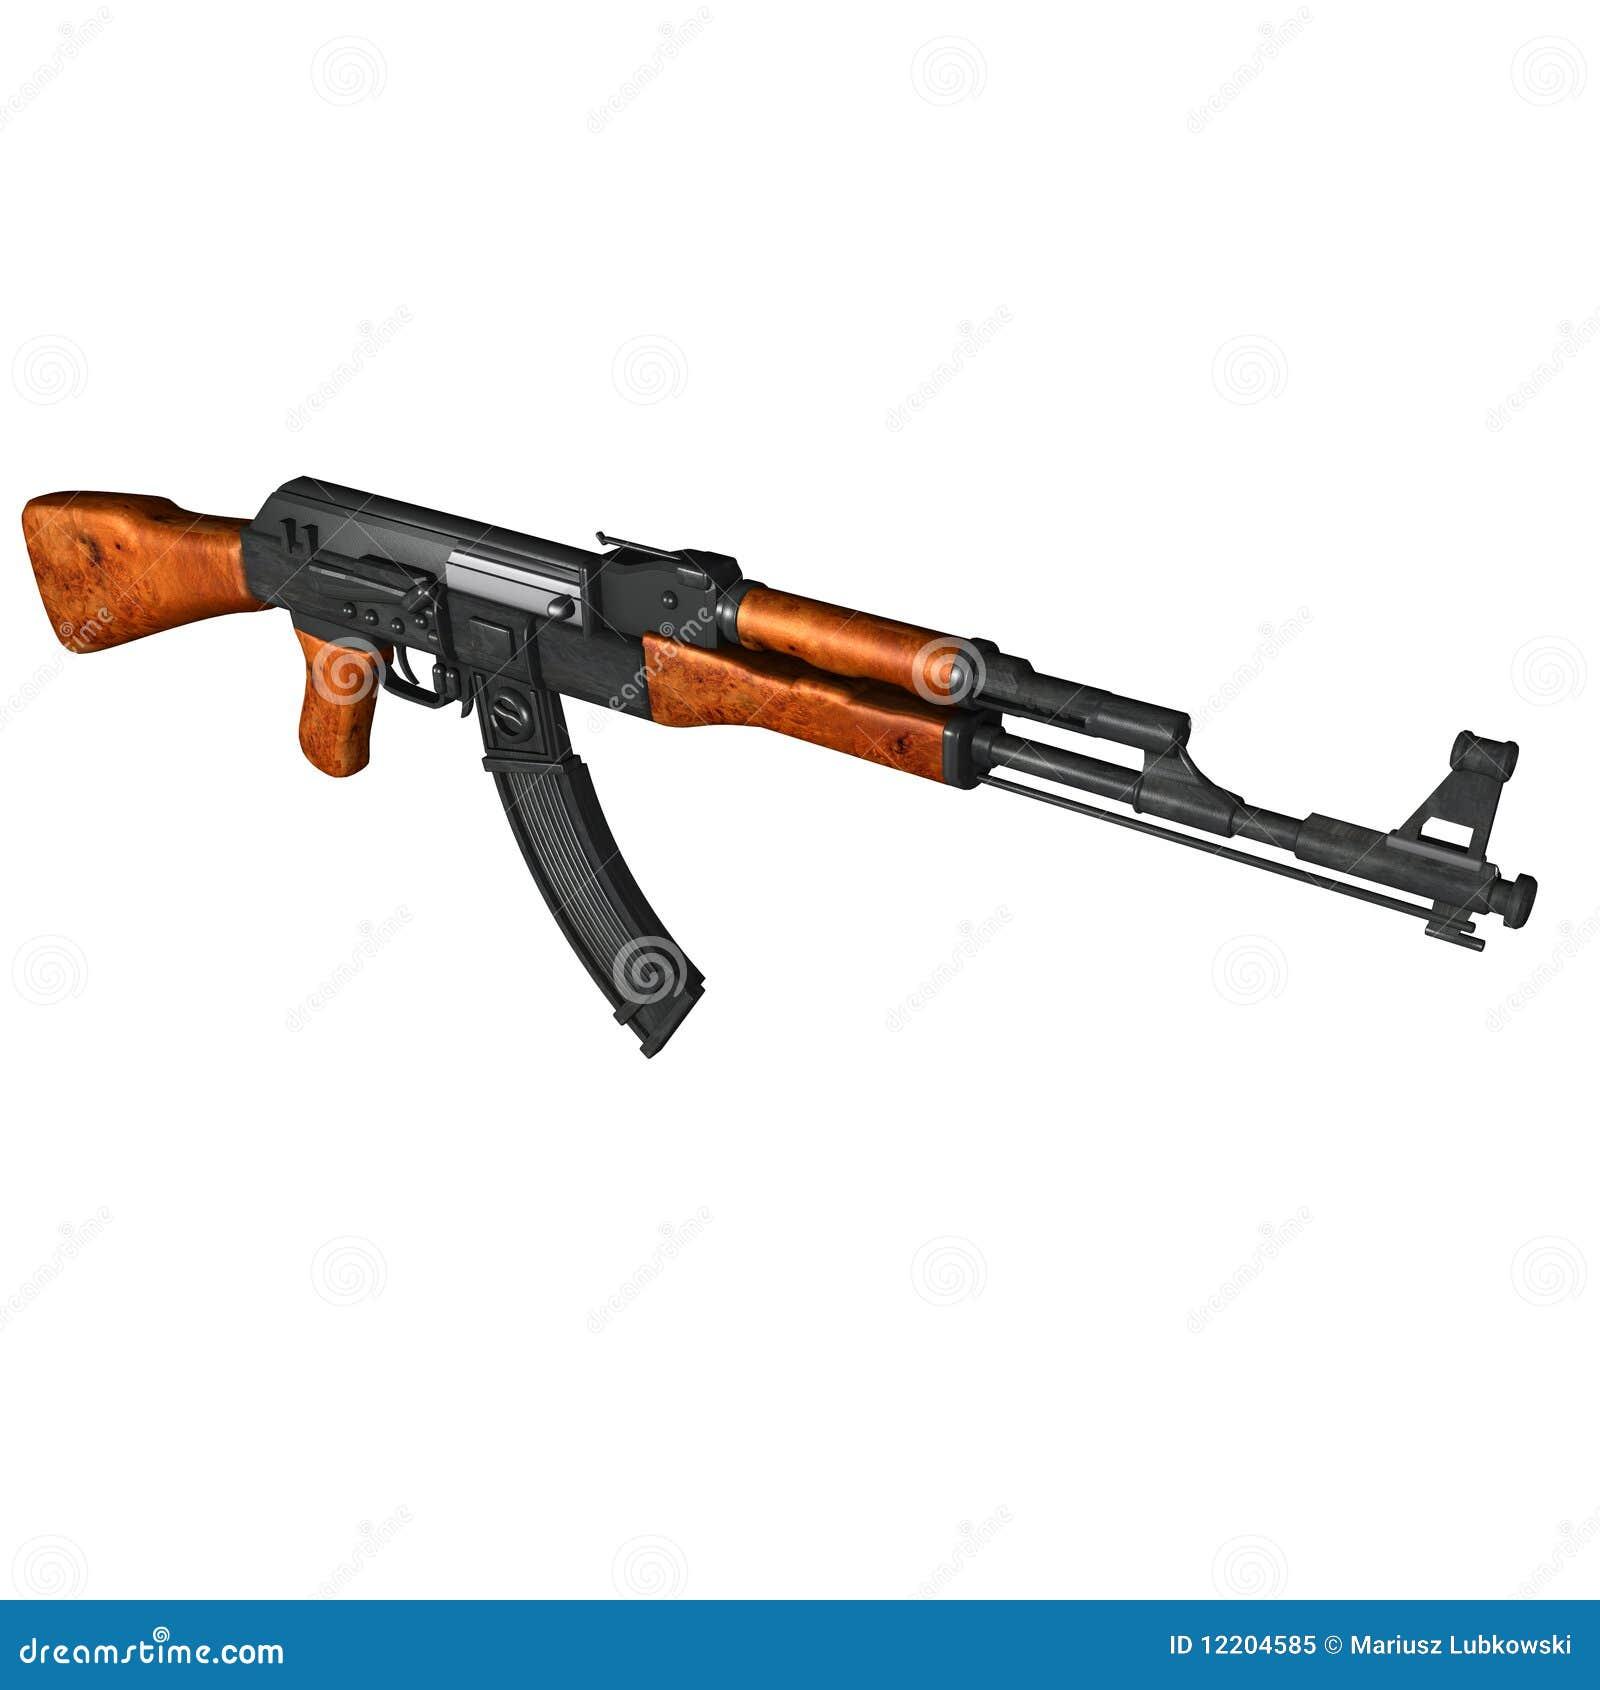 ak47 kalashnikov assault rifle stock image image 12204585